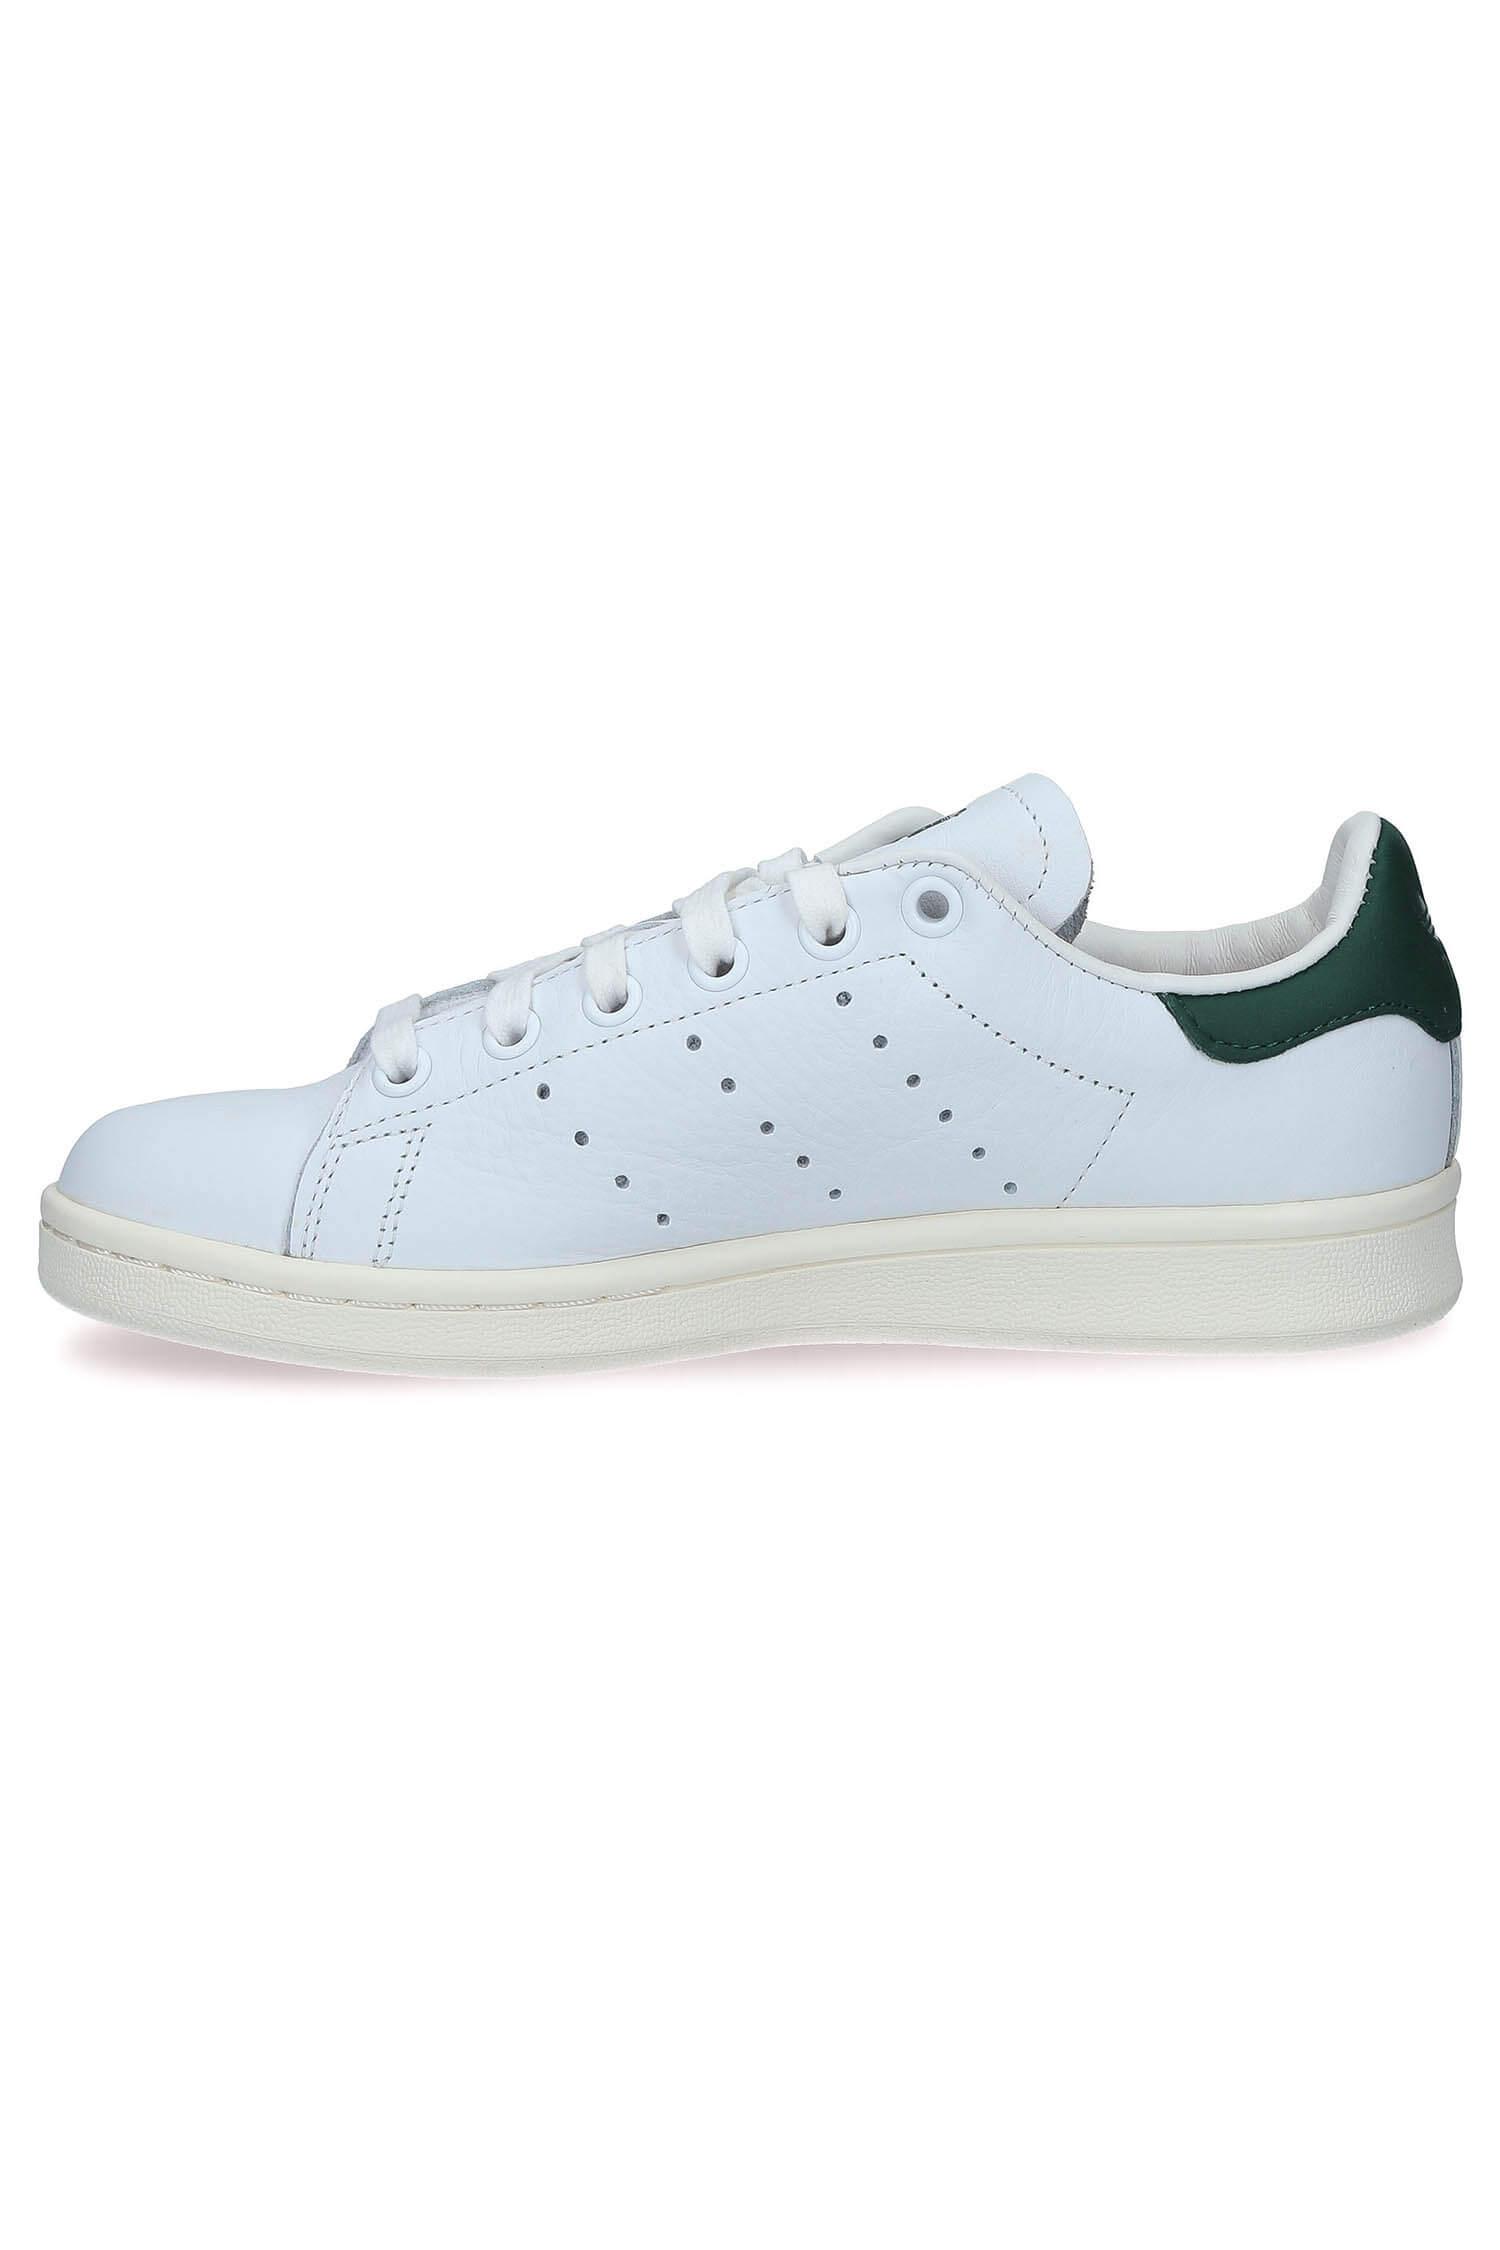 ... Adidas Originals / Stan Smith patch vert ...